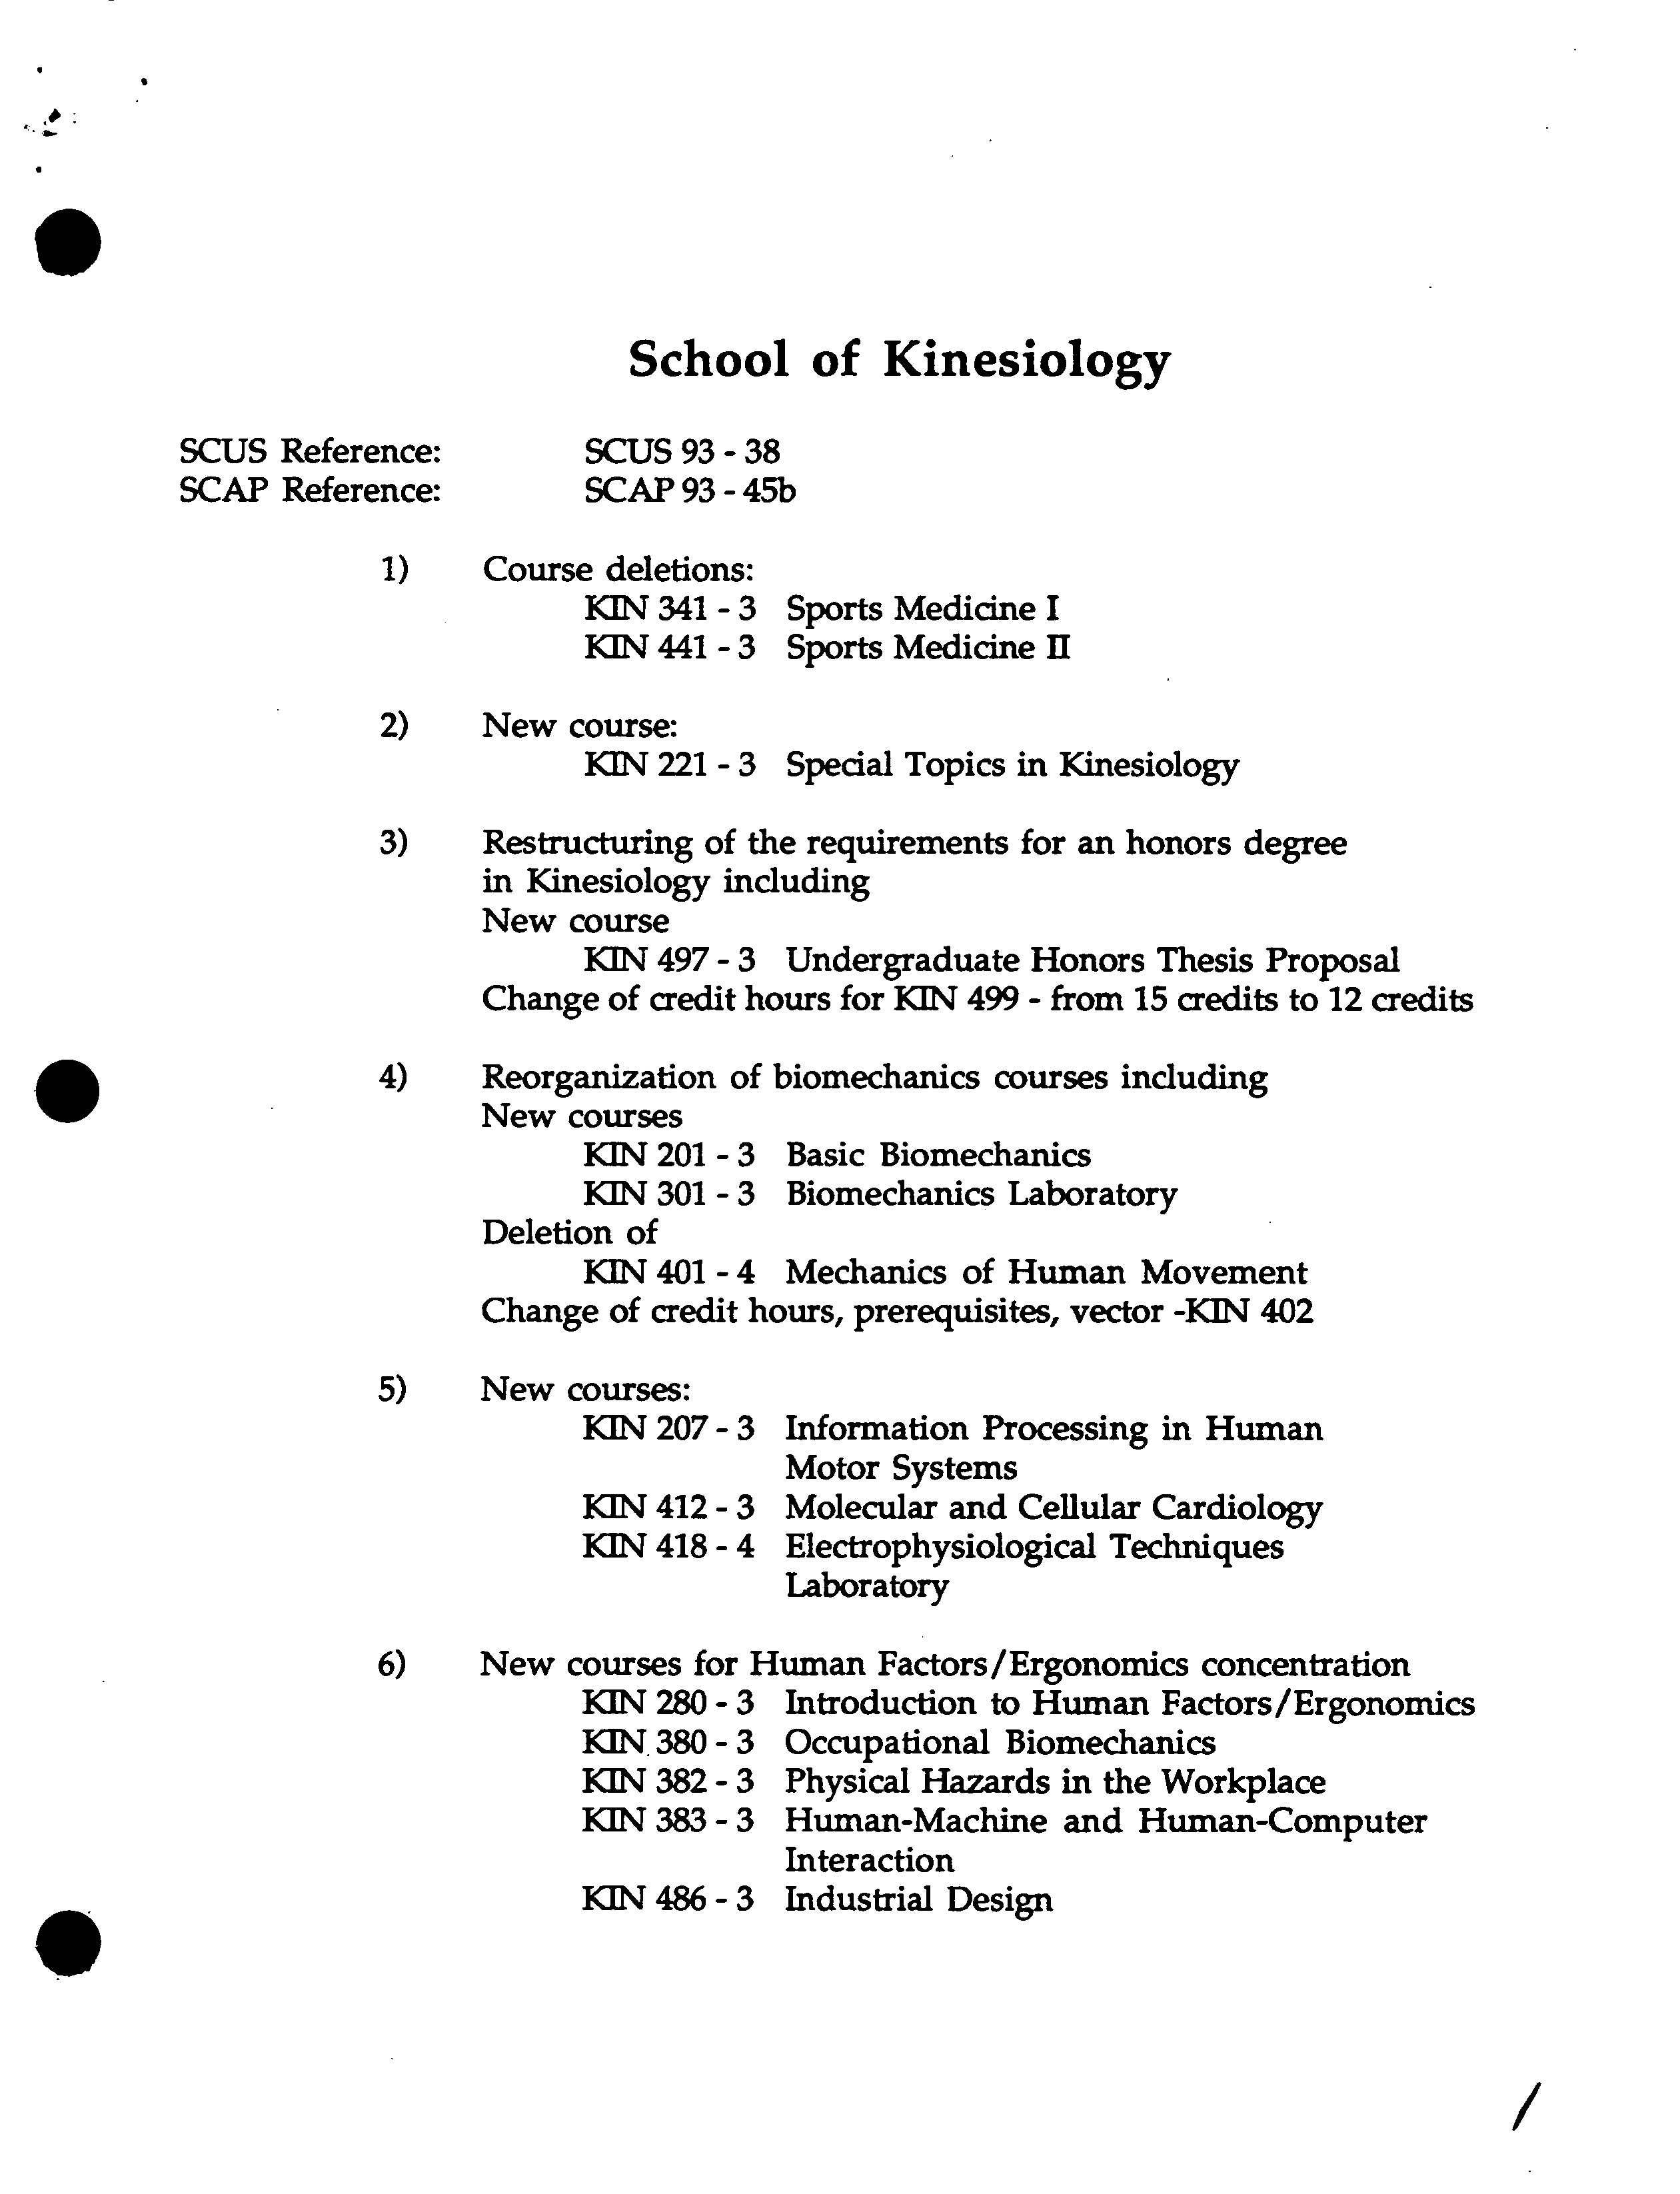 kinesiology topics